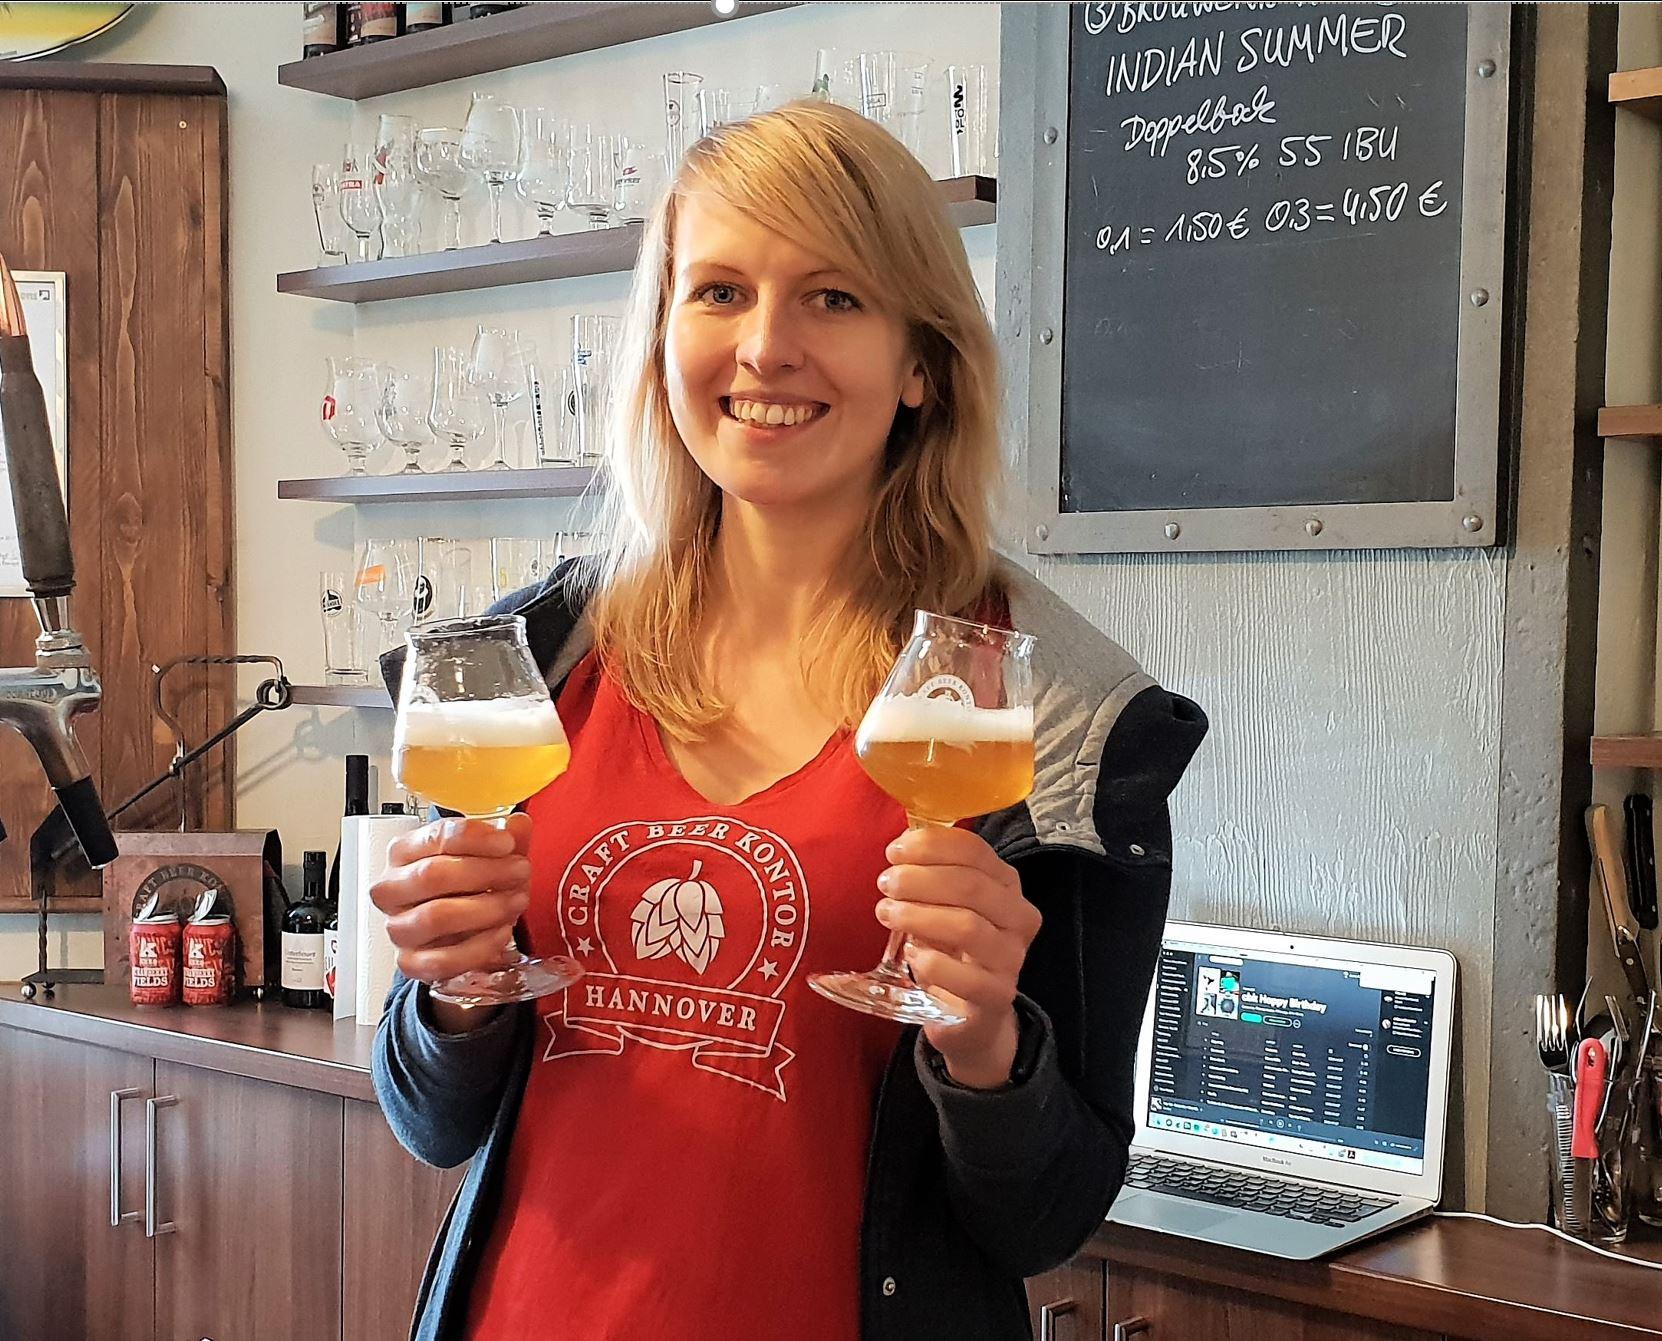 Style Hannover Craft Beer Kontor Janina B - Dein Kiez